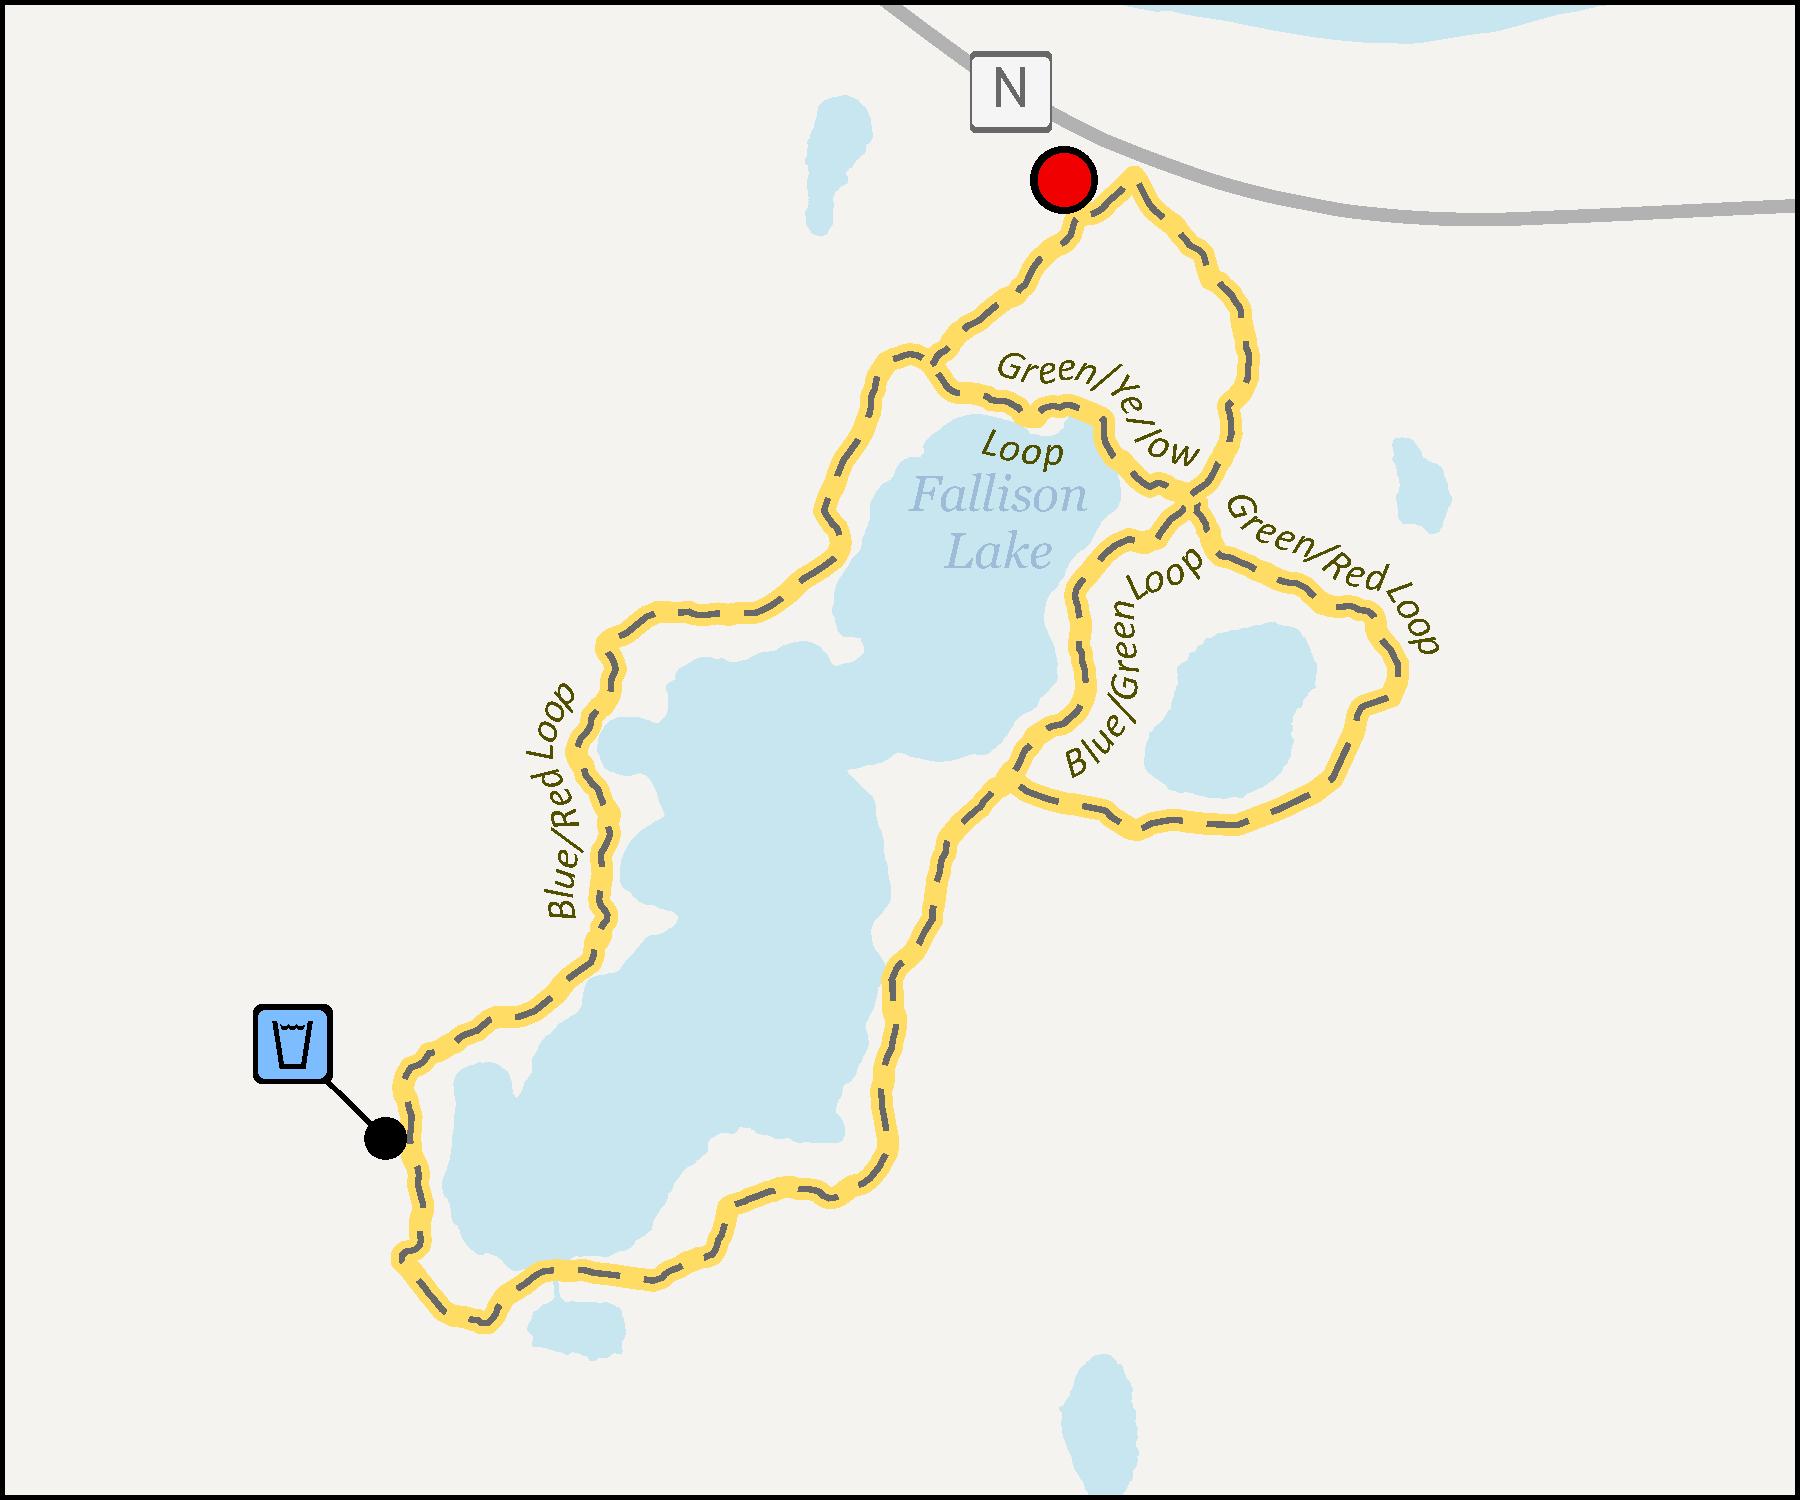 Fallison Lake Trails